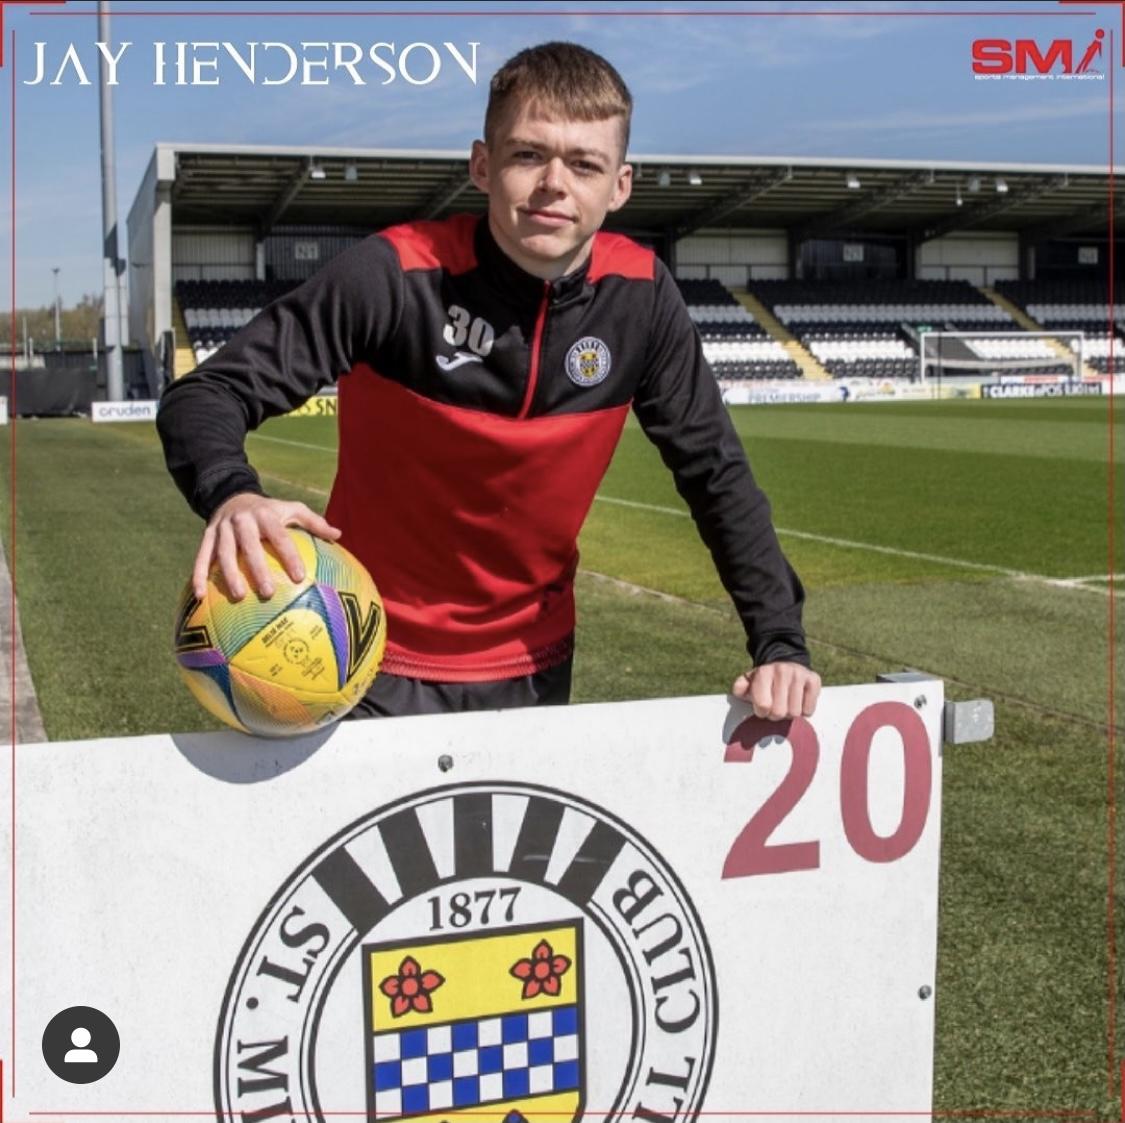 Jay Henderson new deal